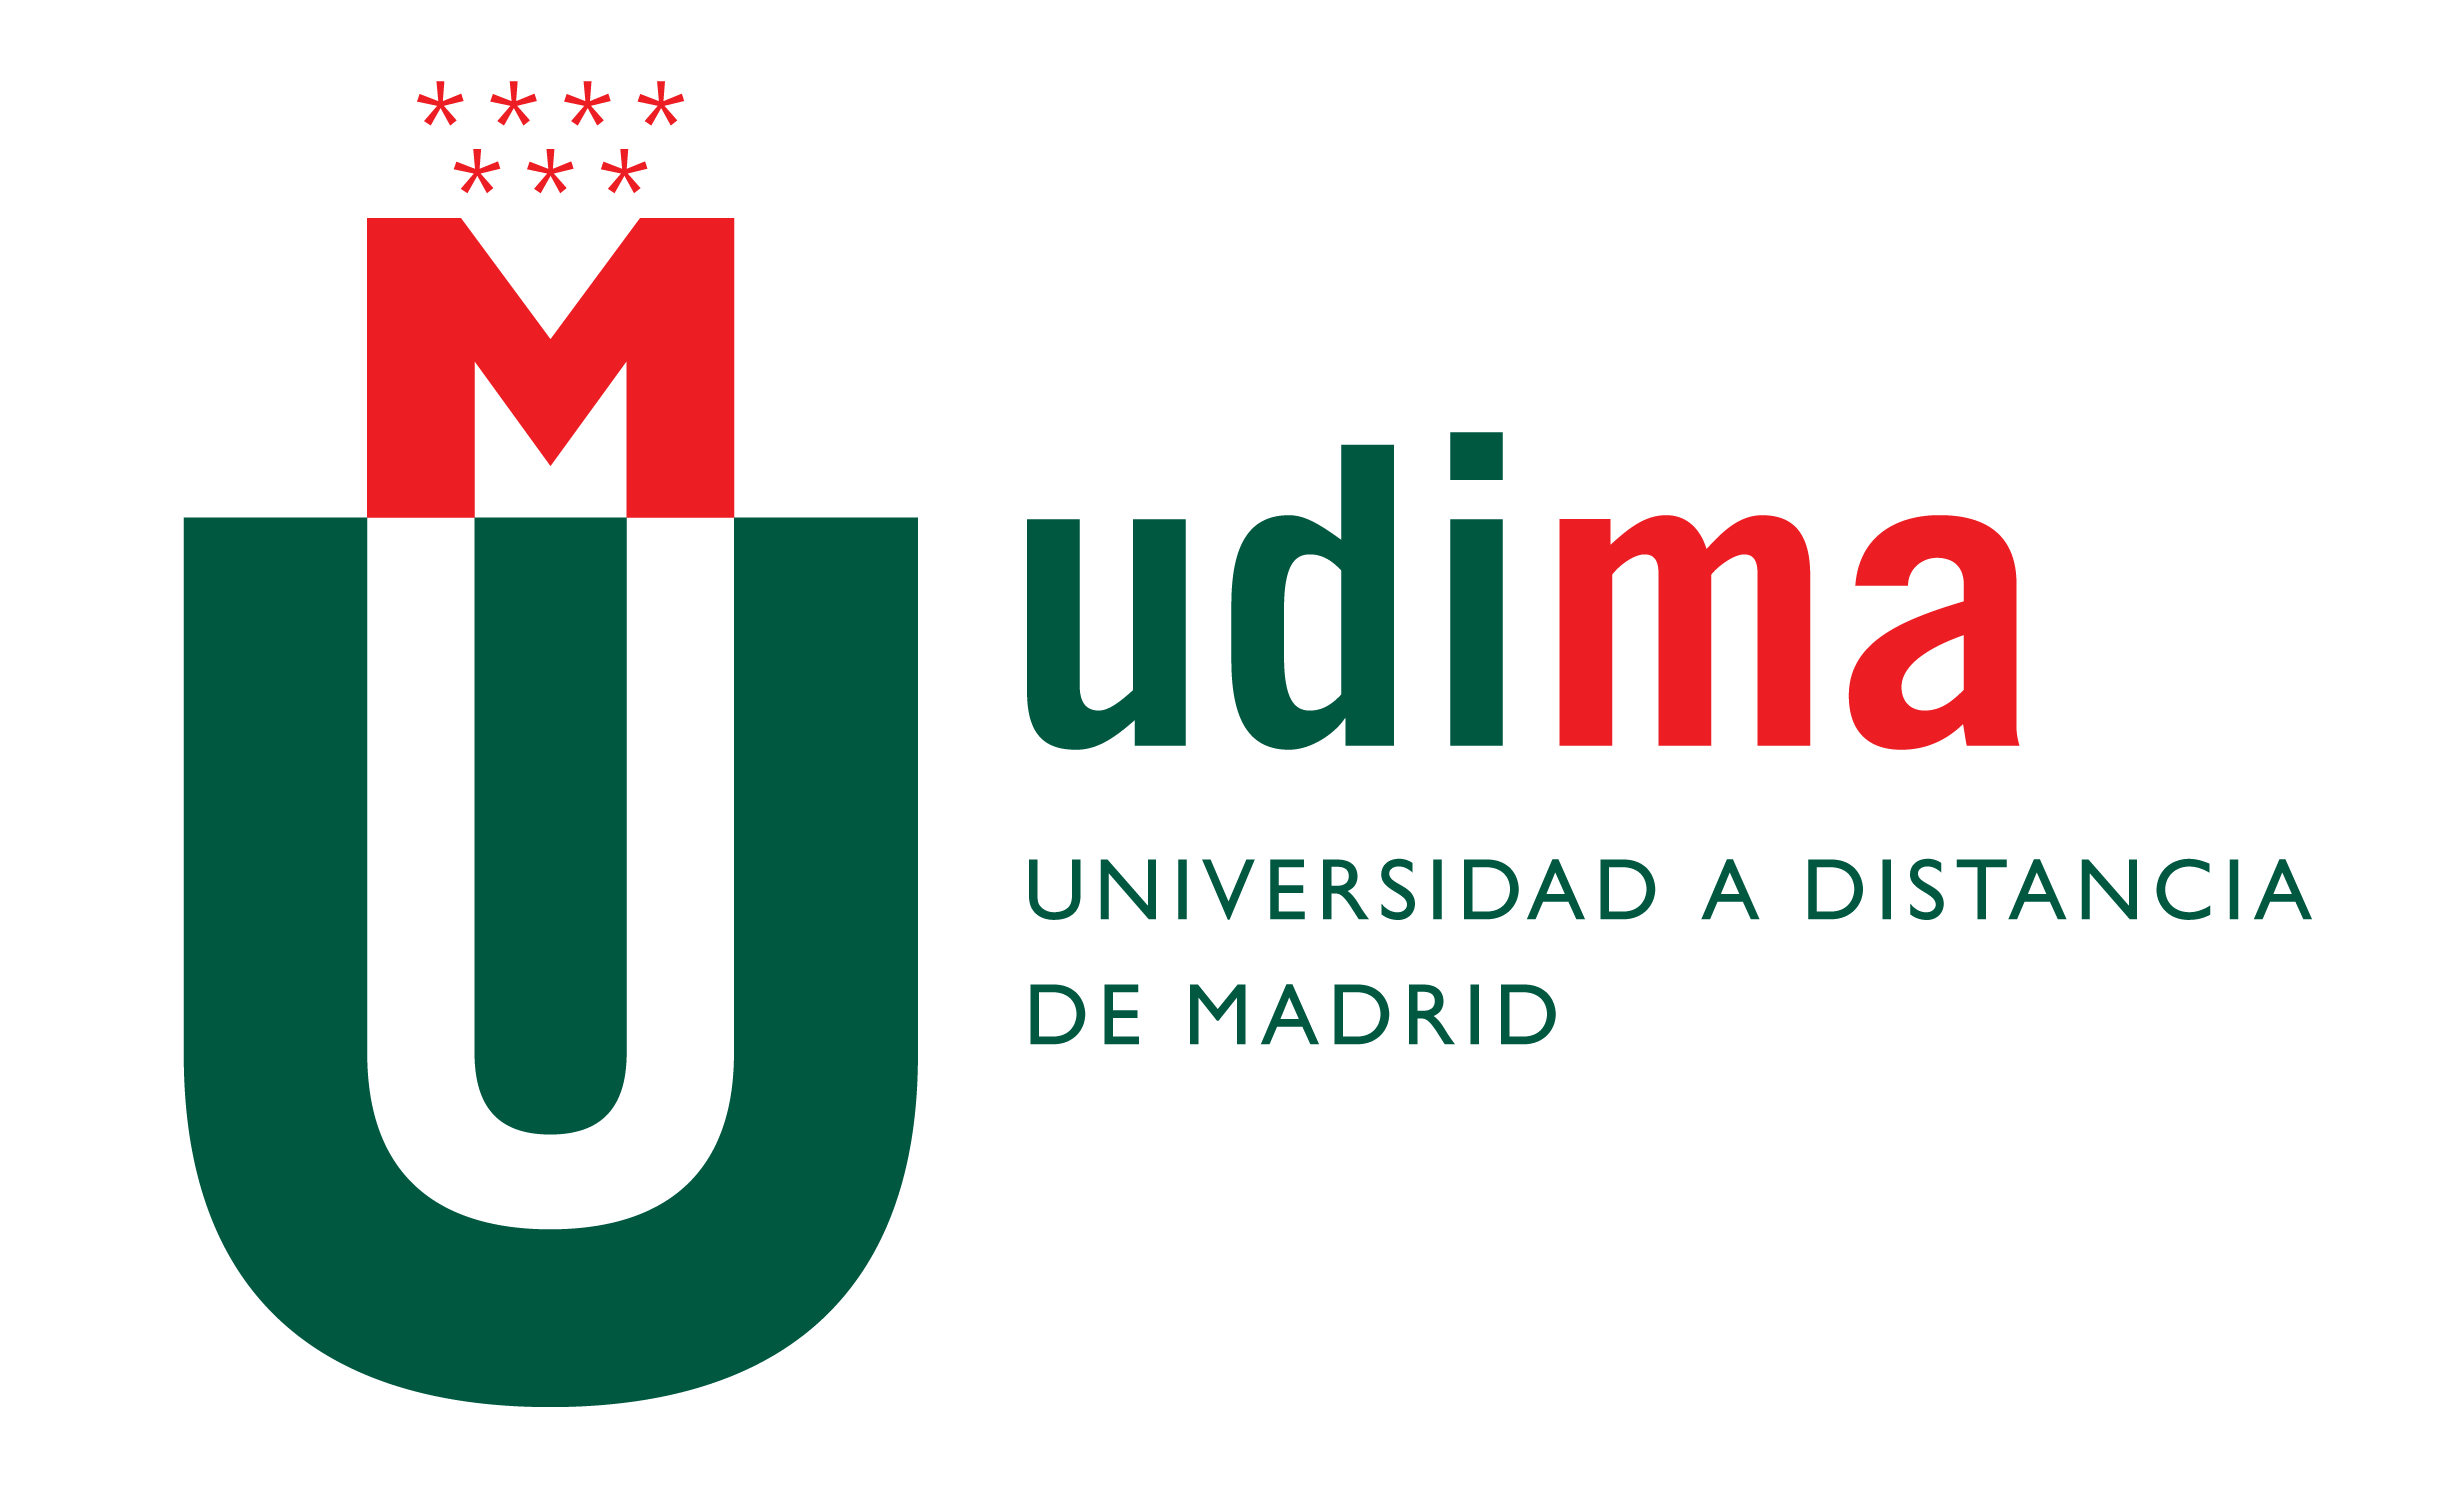 http://www.udima.es/es/iii-jornadas-educacion-2017.html